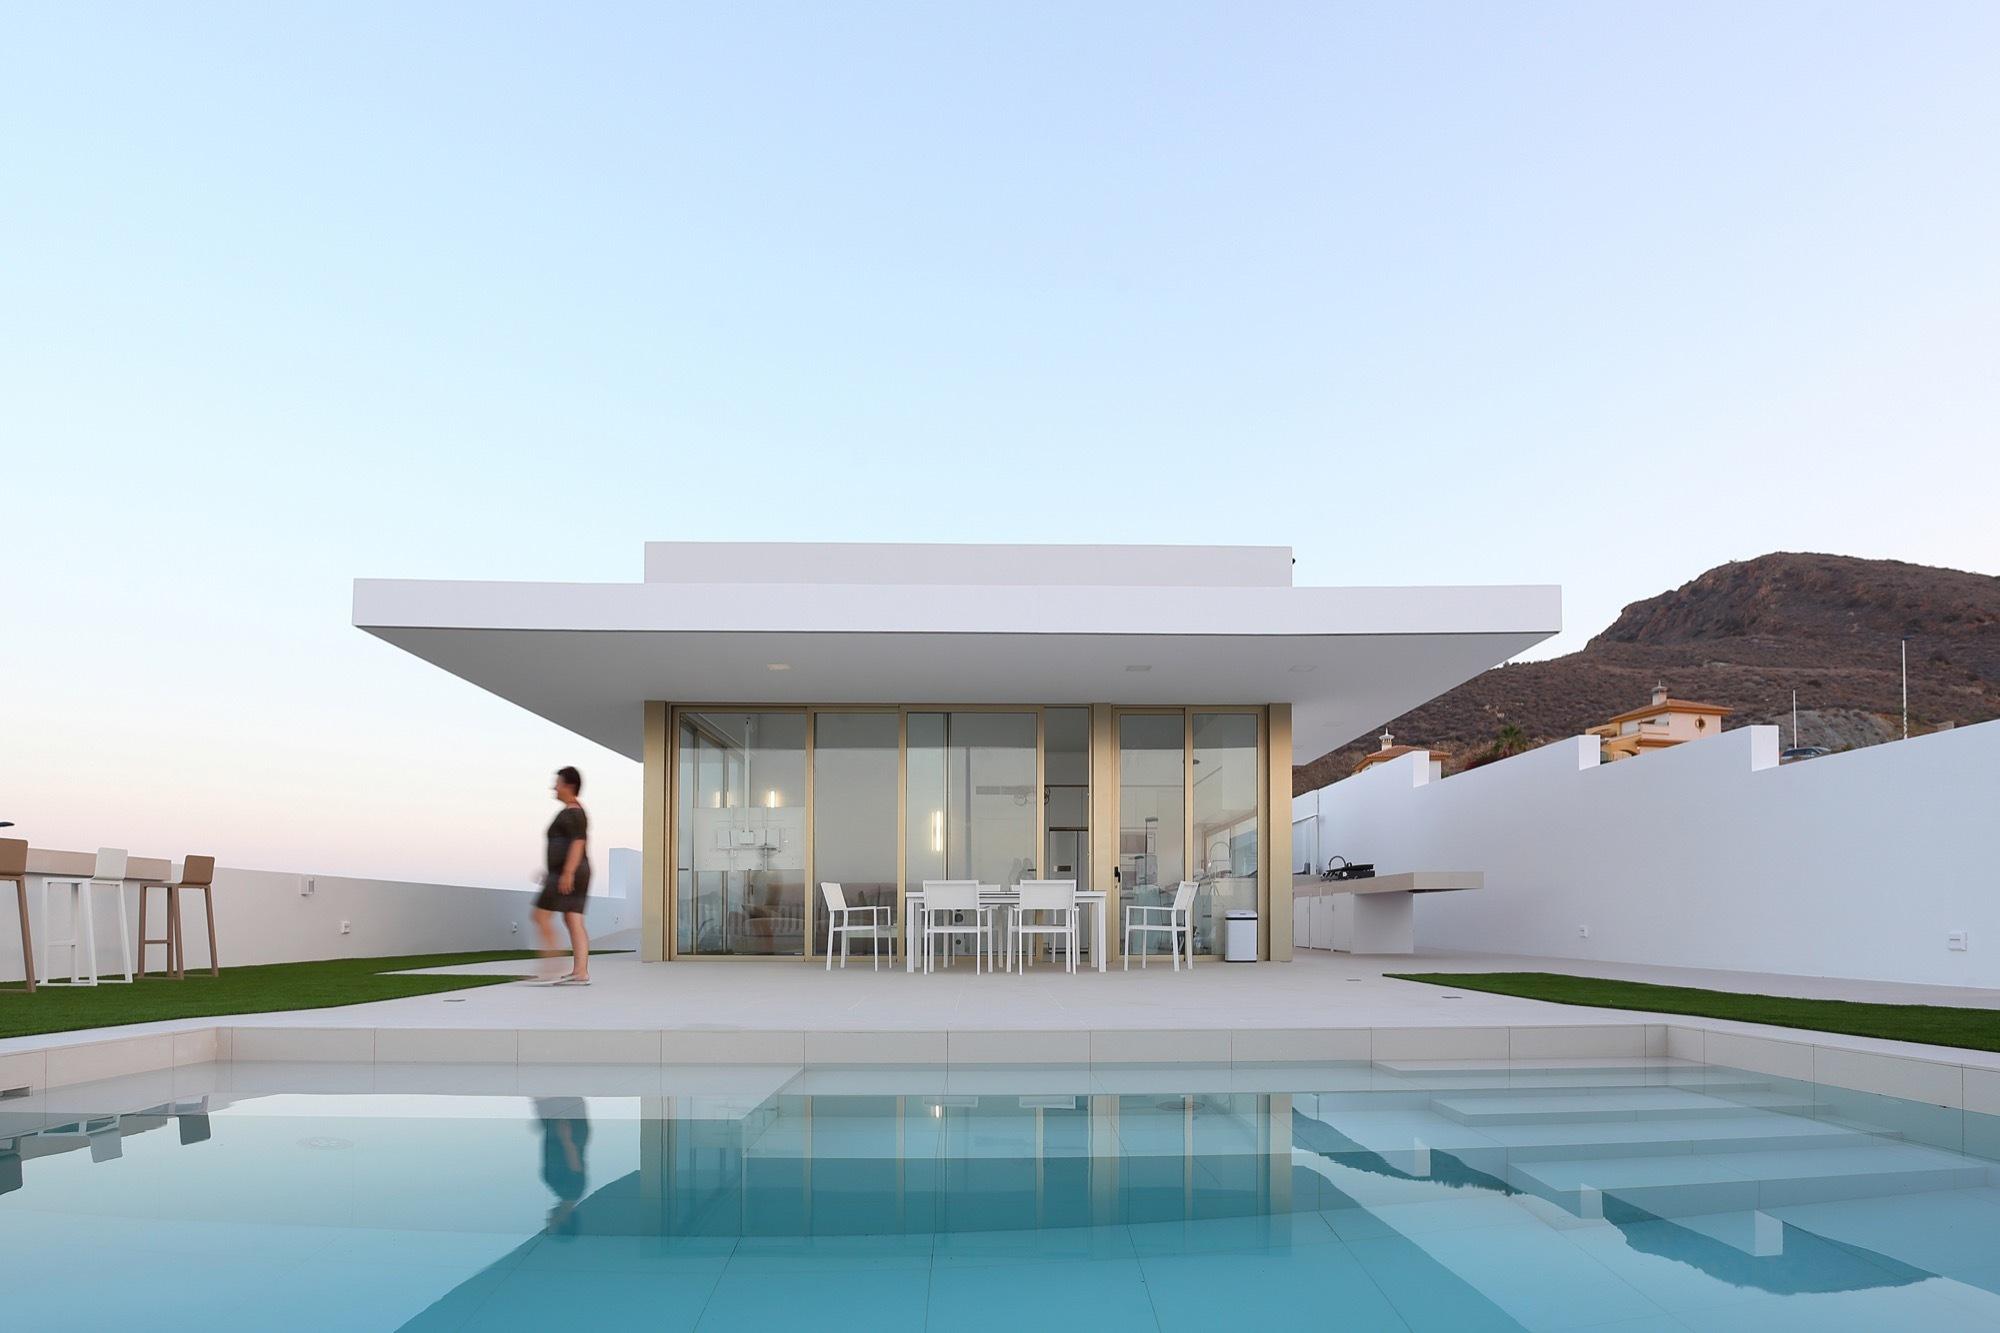 Casa con porche en voladizo pepa d az plataforma - Que es un porche en arquitectura ...